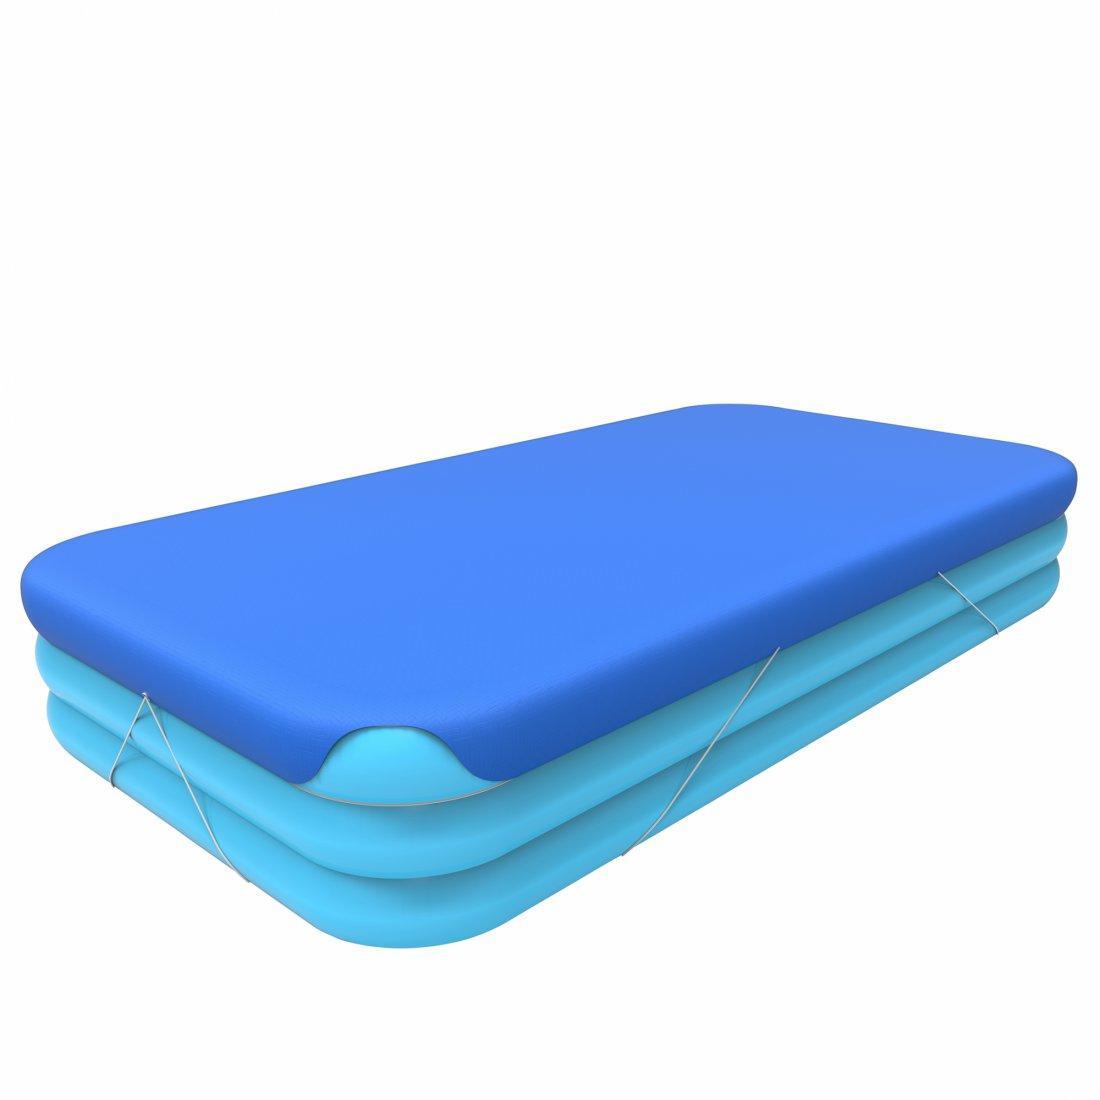 jilong pool abdeckung rechteckig abdeckplane f r pool gr 360x188 bis 366x193 cm familienpool. Black Bedroom Furniture Sets. Home Design Ideas